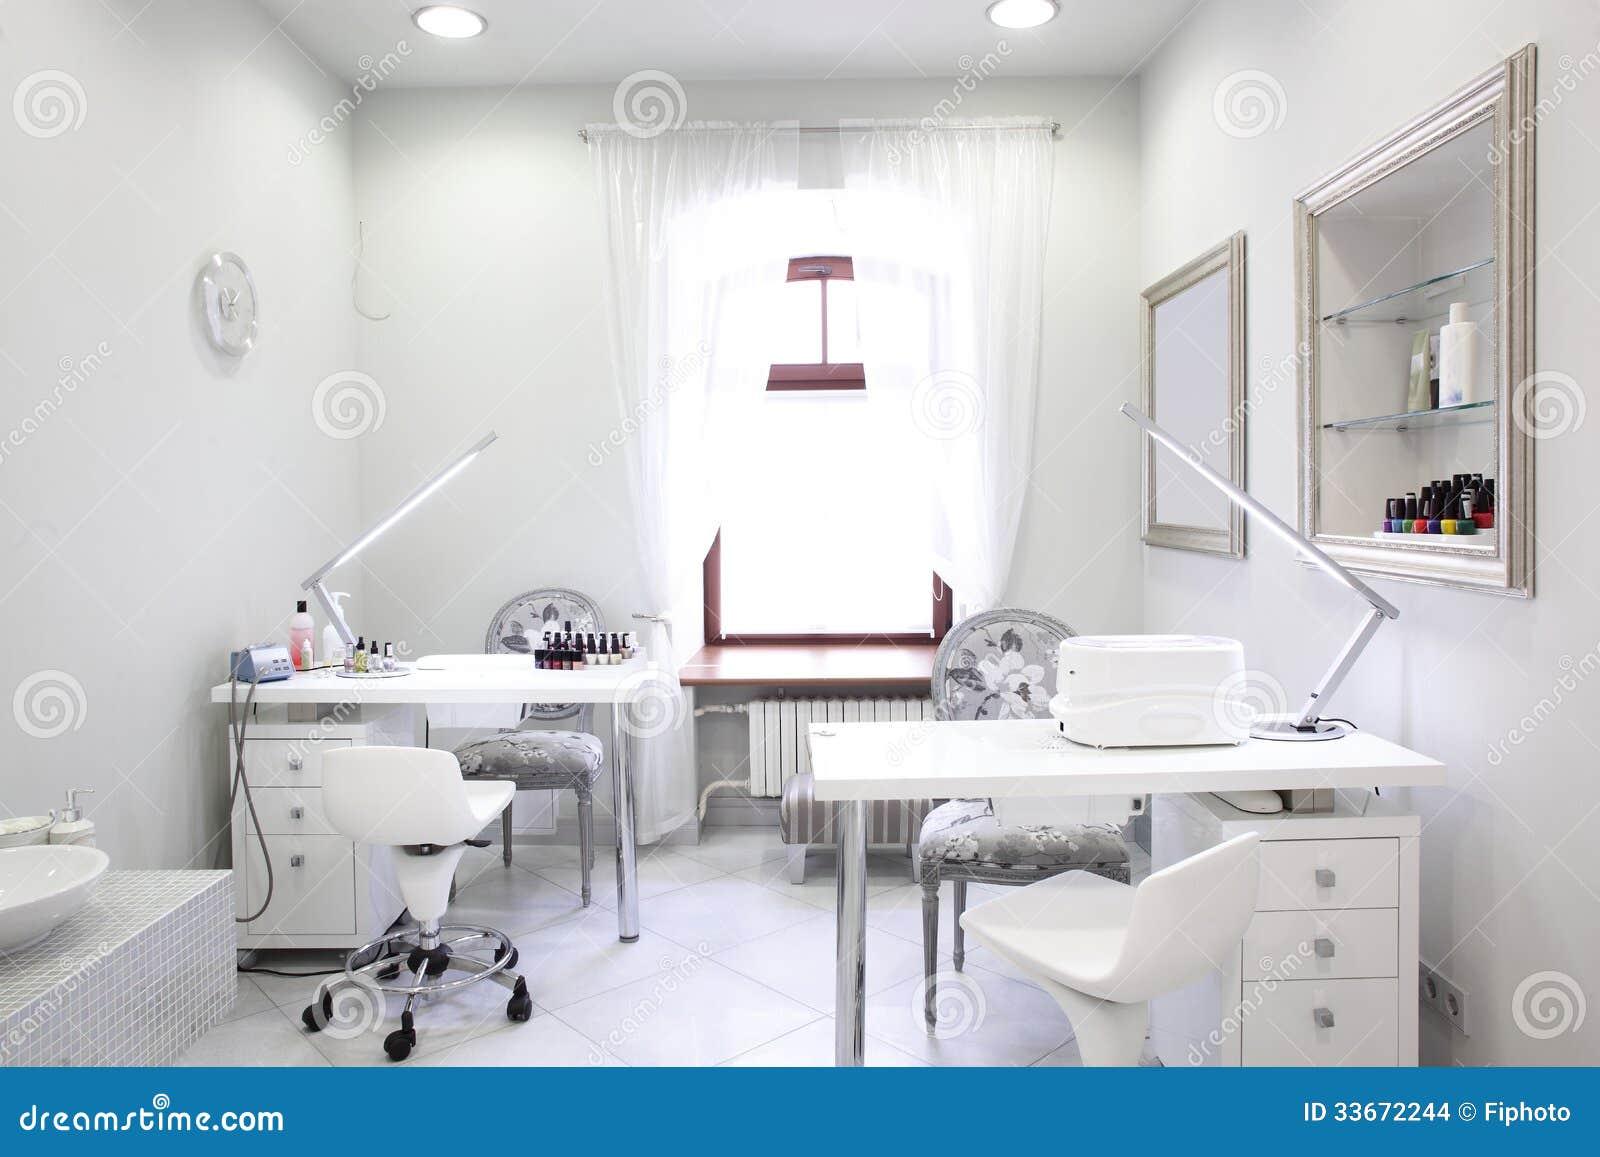 European Luxury Medical Clinic Stock Images Image 33672244